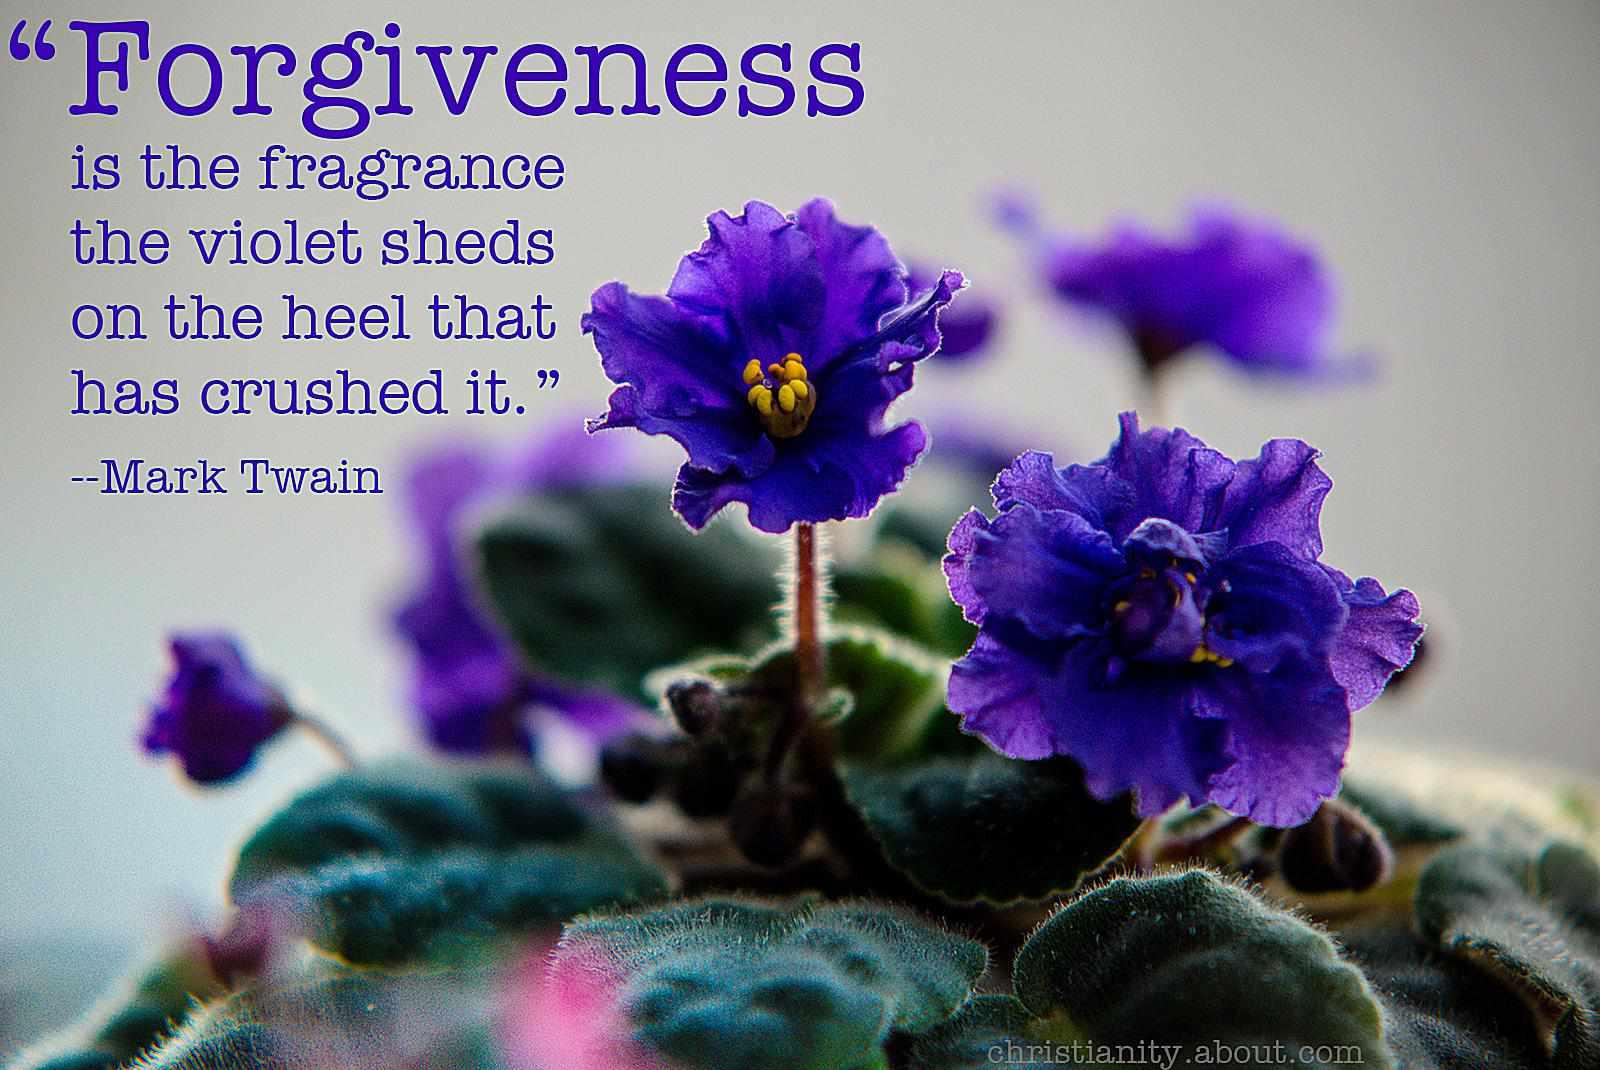 Forgiveness Emits a Fragrance